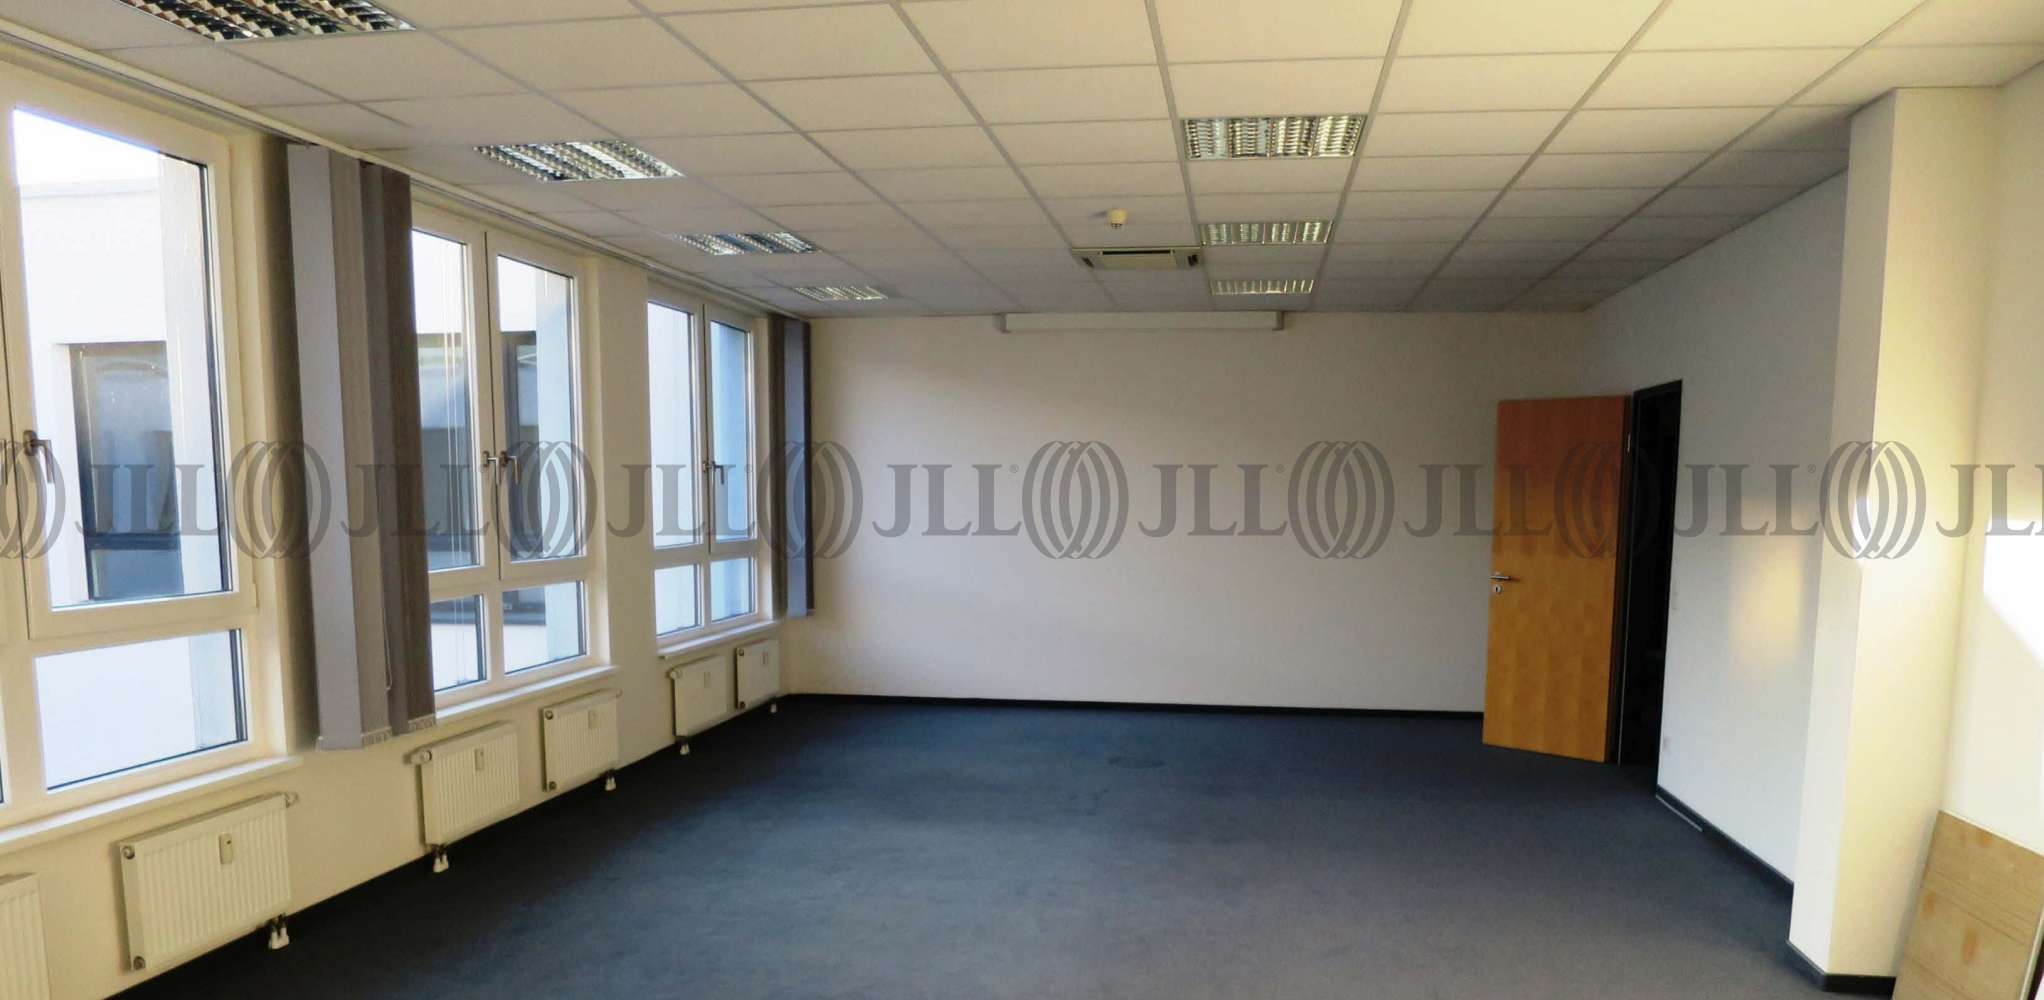 Büros Bad vilbel, 61118 - Büro - Bad Vilbel - F1113 - 9524742